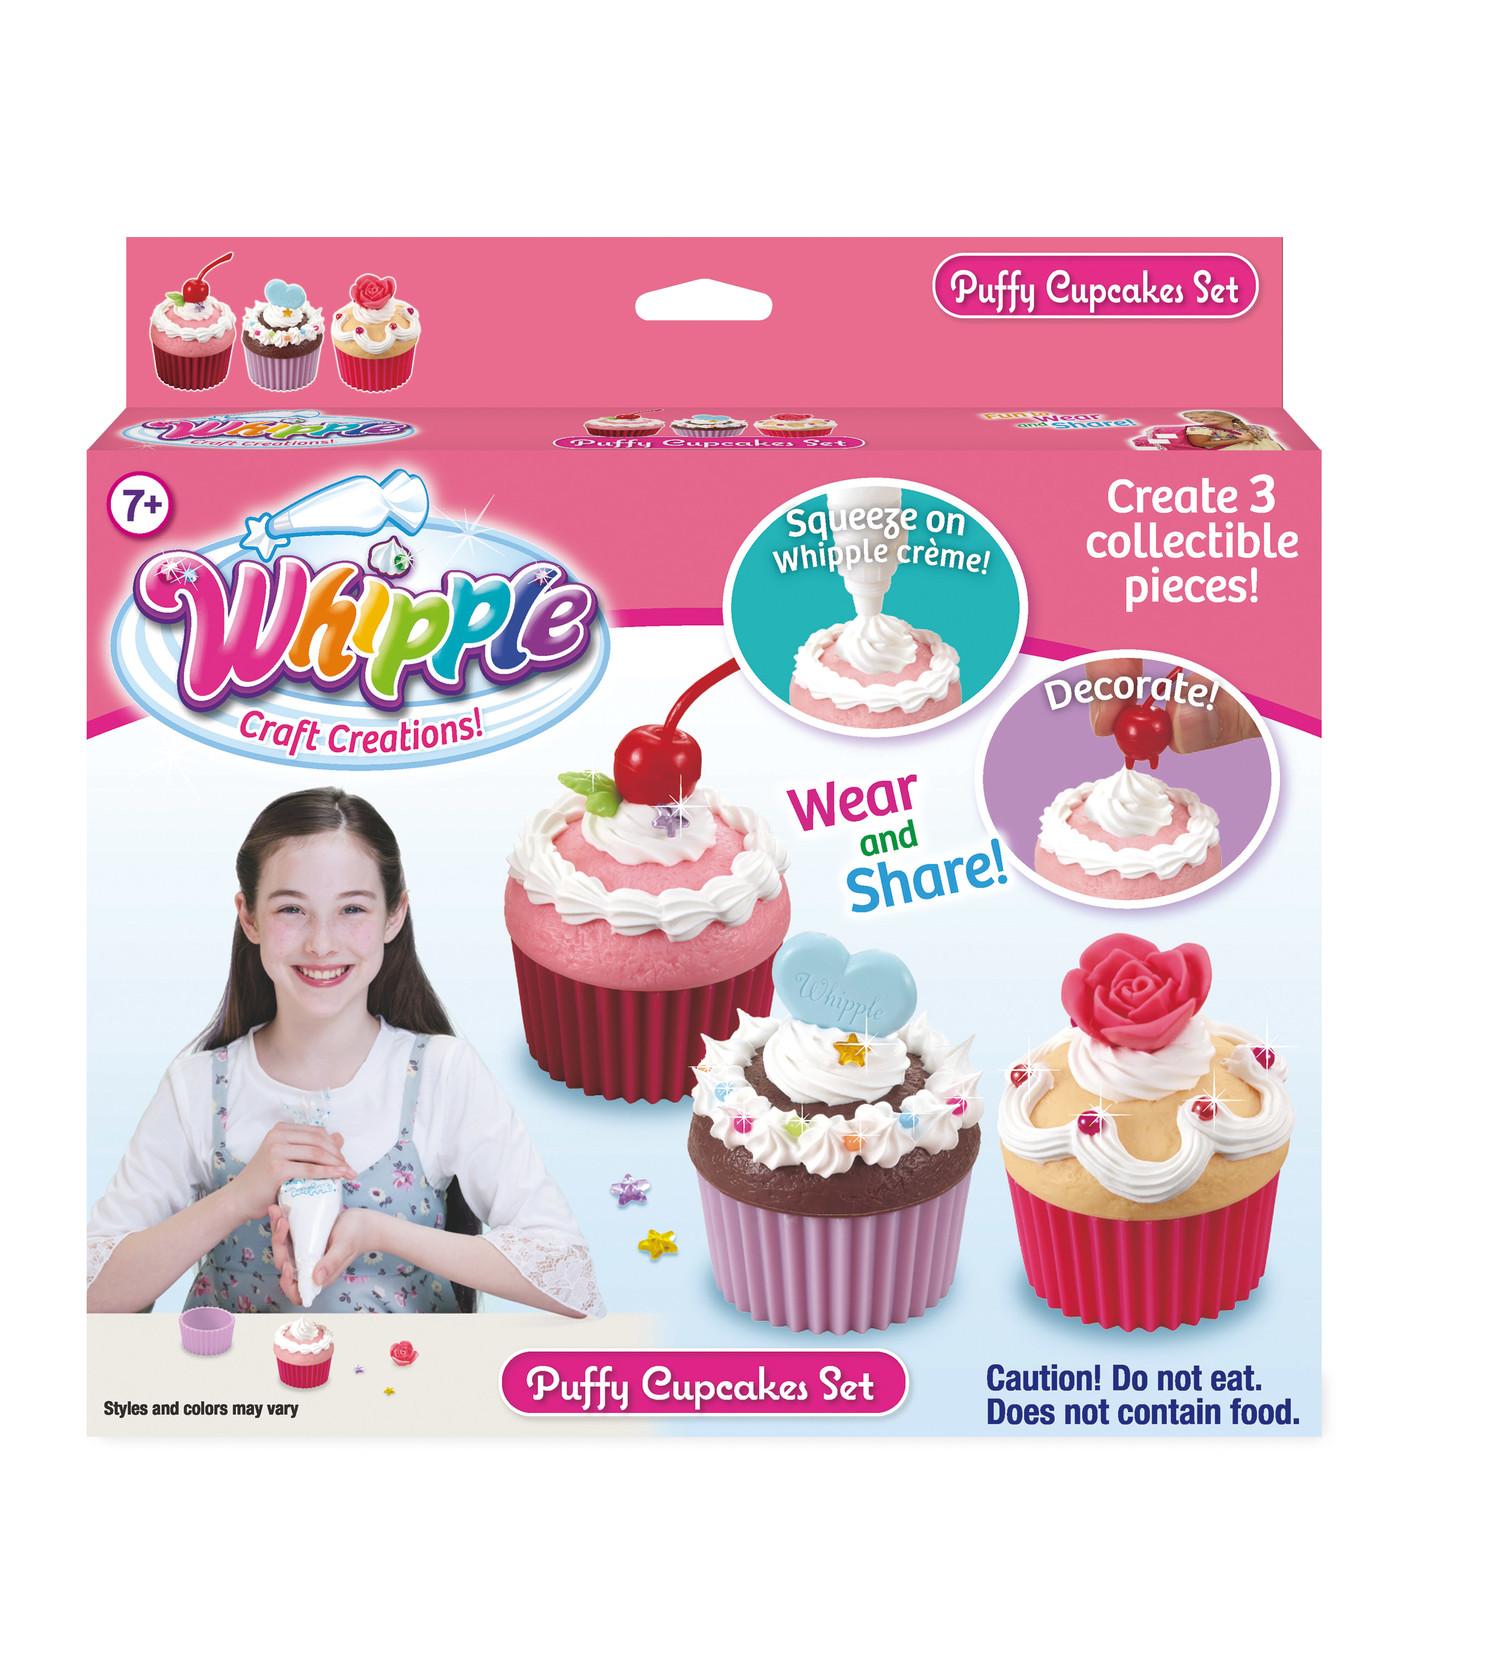 Whipple Puffy Cupcake Decorating Set